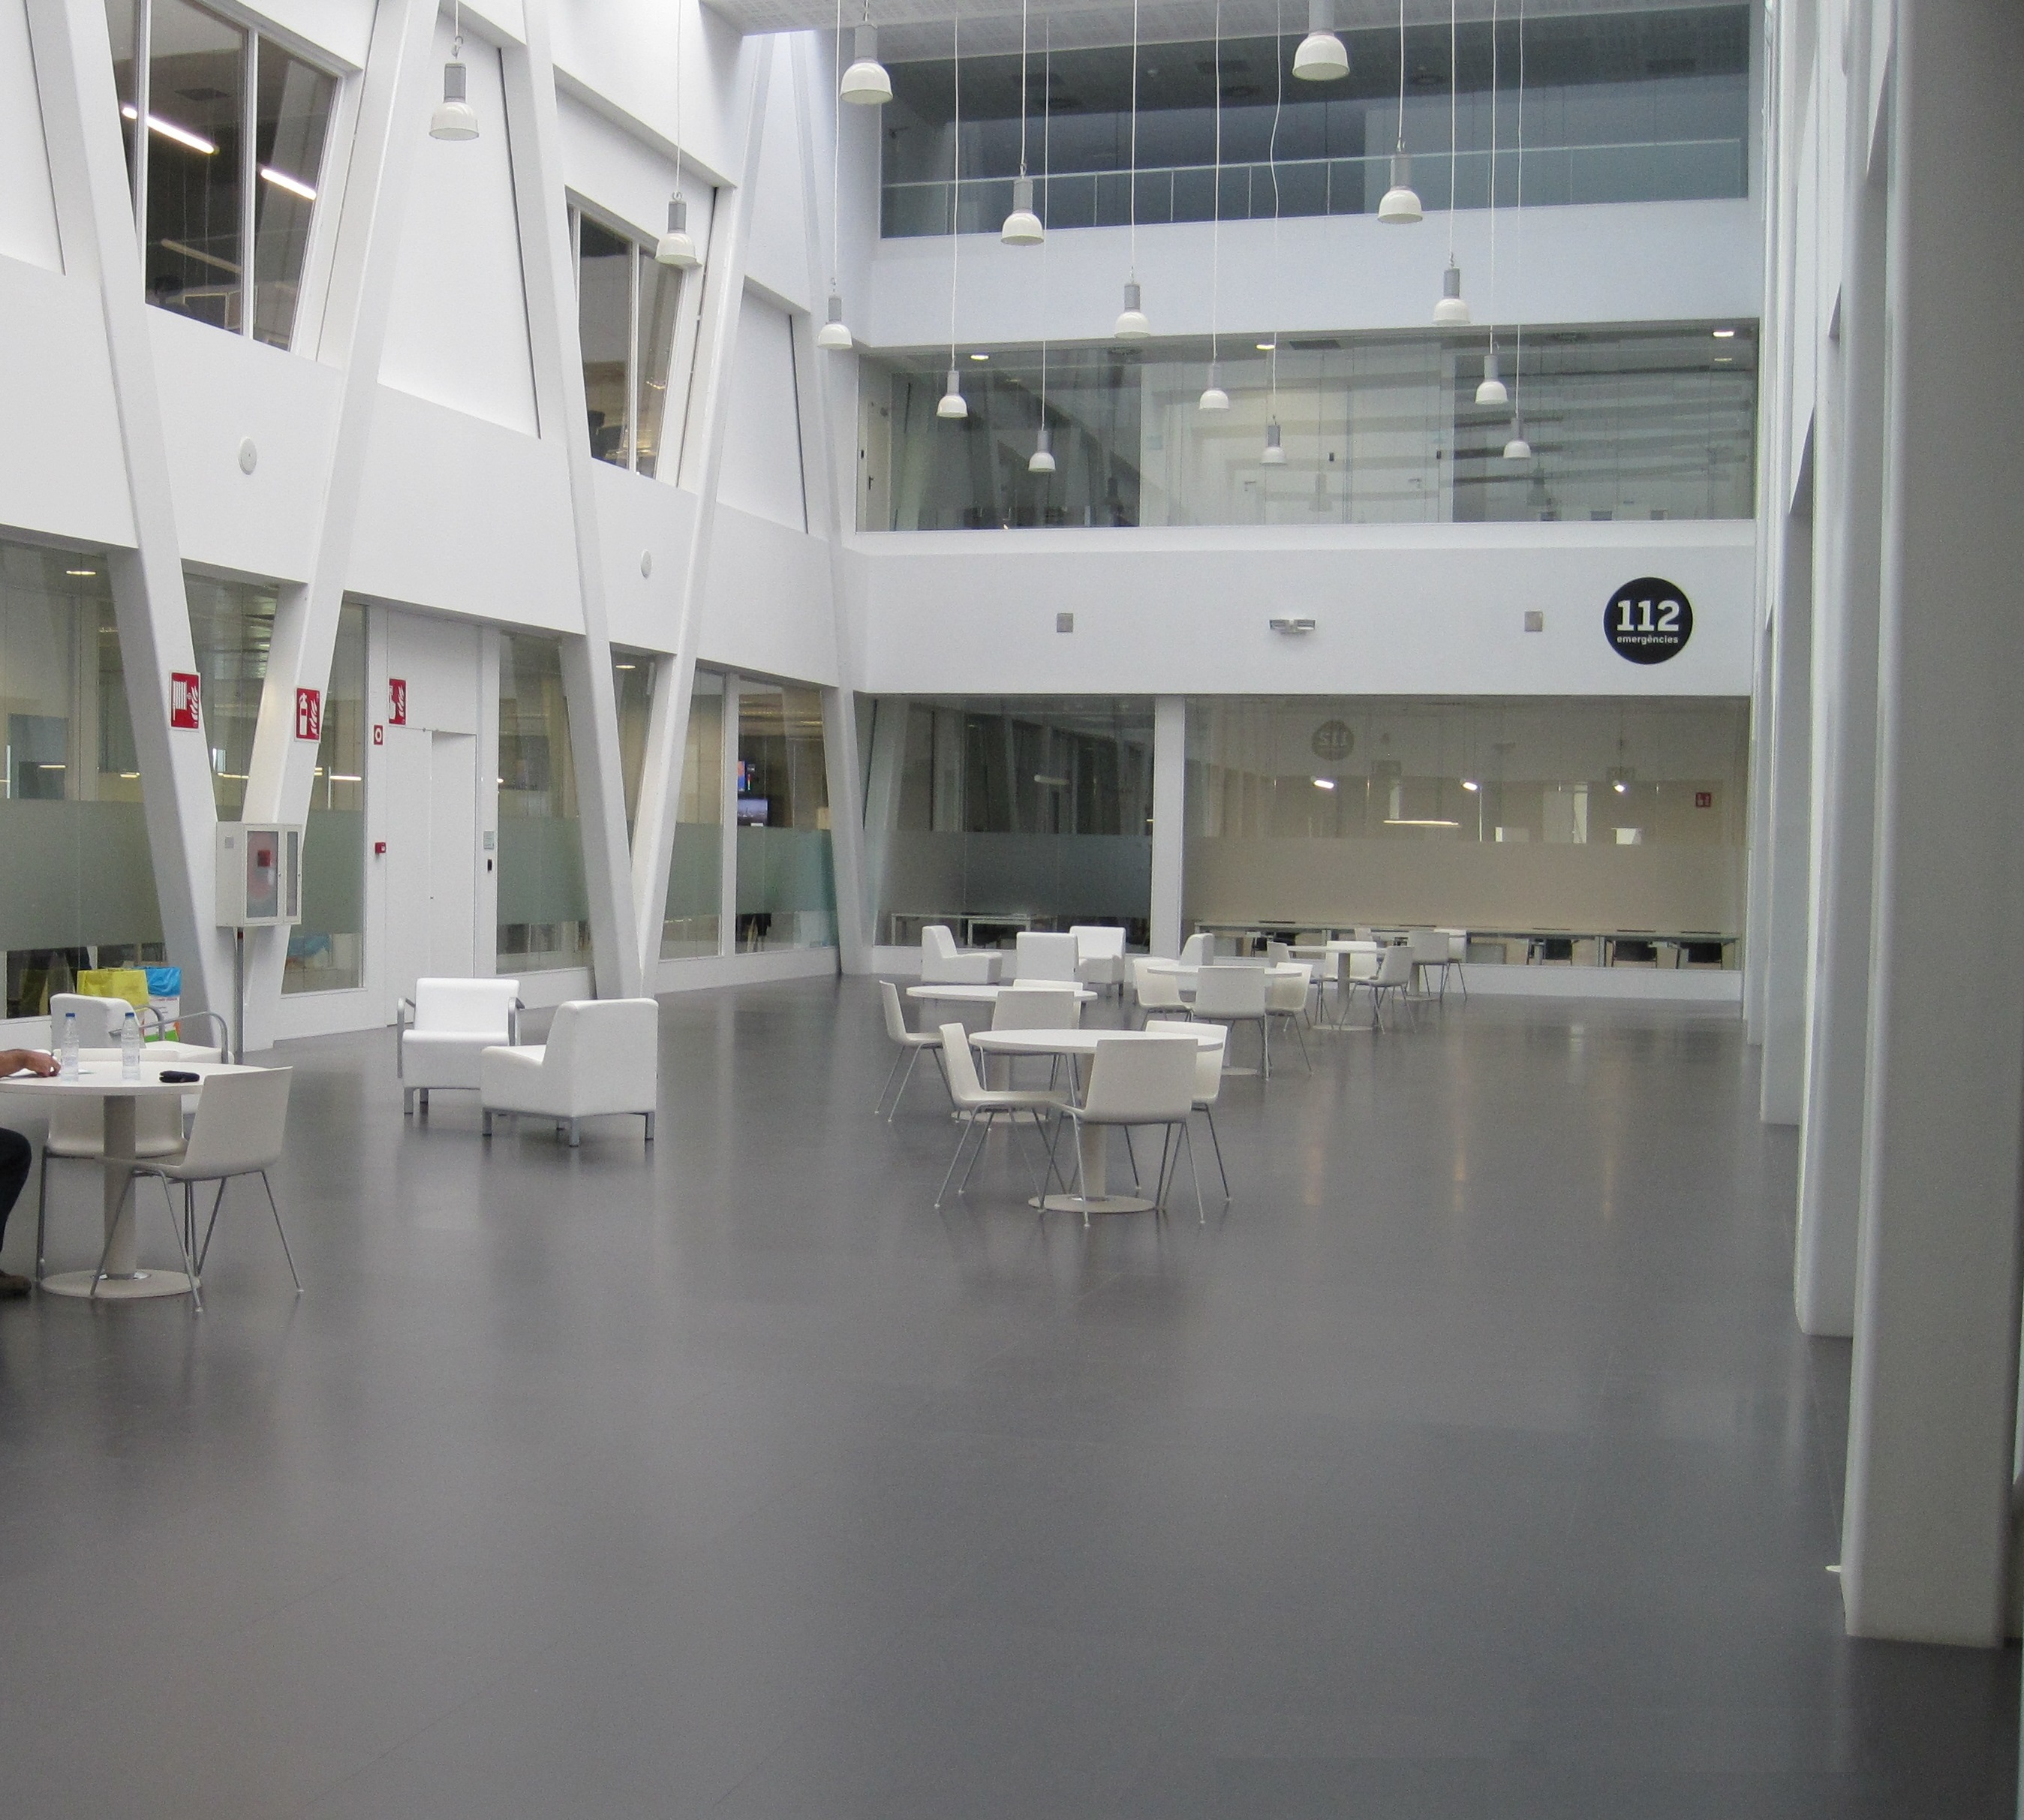 Trabajos de repasos de obra del centro 112 de reus const cnia empresa constructora - Constructora reus ...